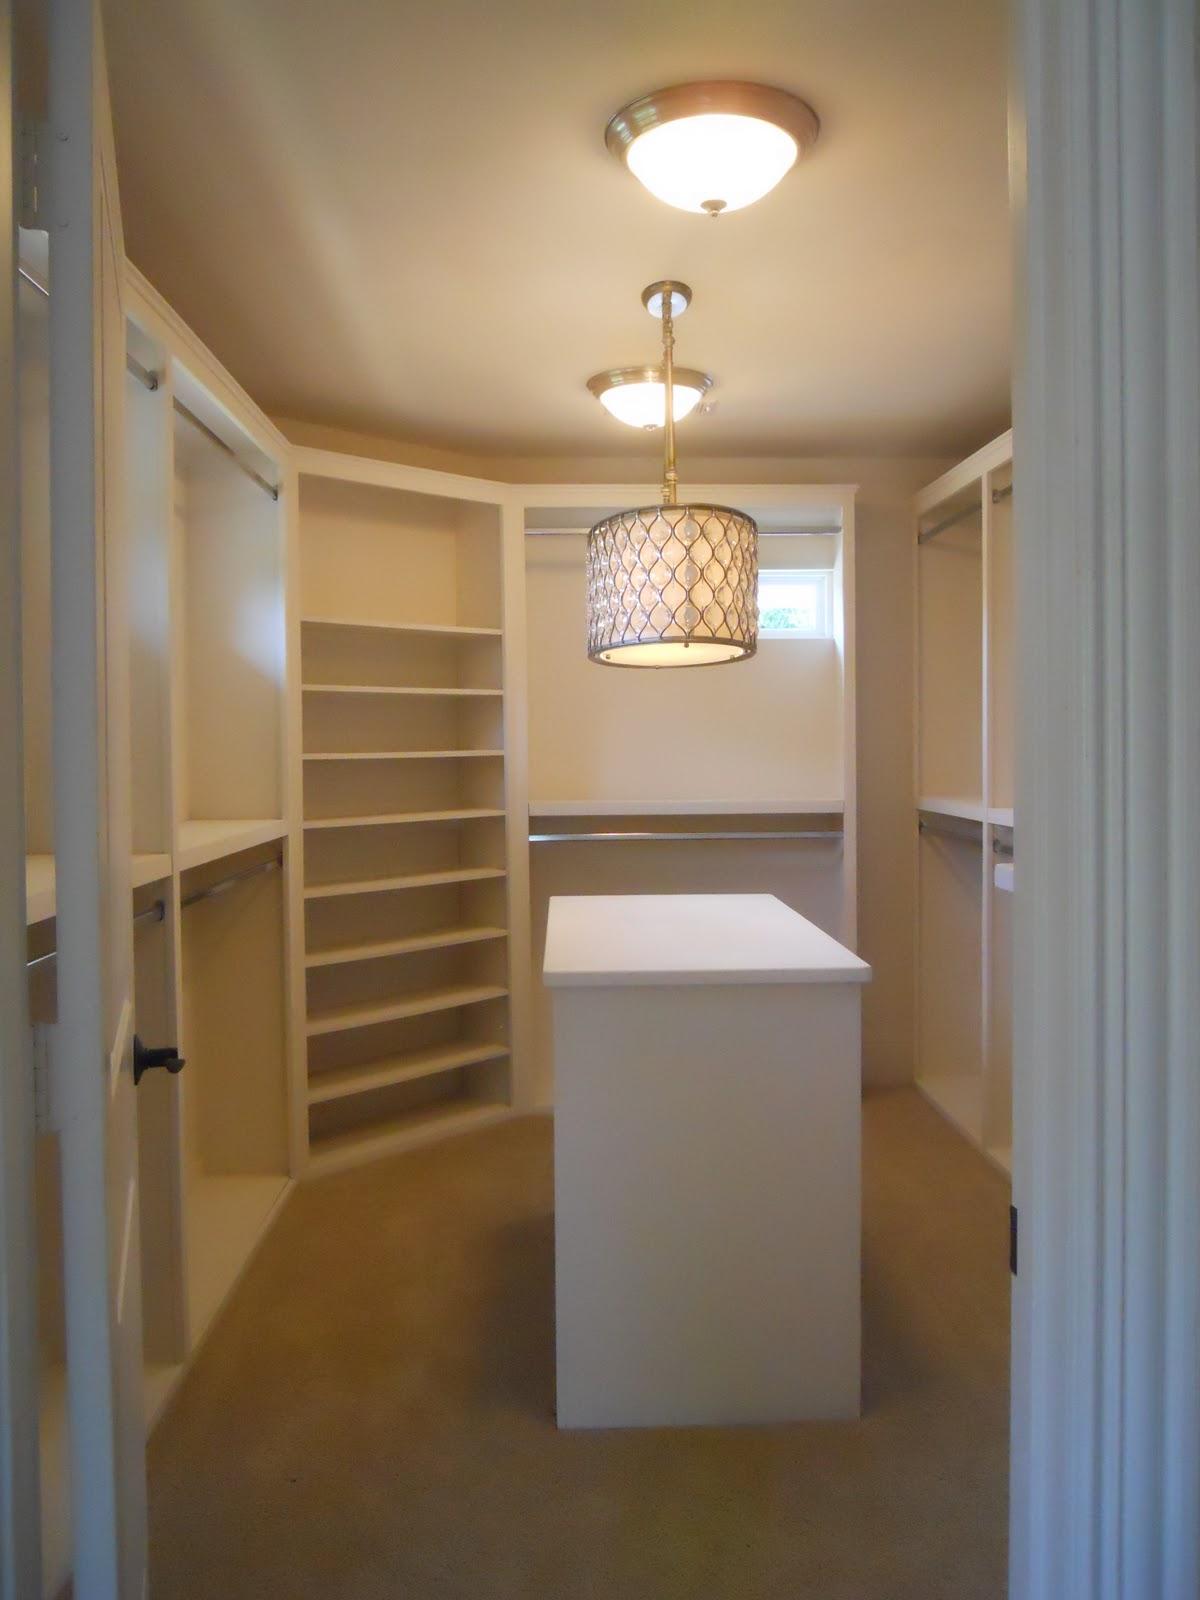 walk in closet lighting. Closet Light Fixture Stunning With Walk In Lighting